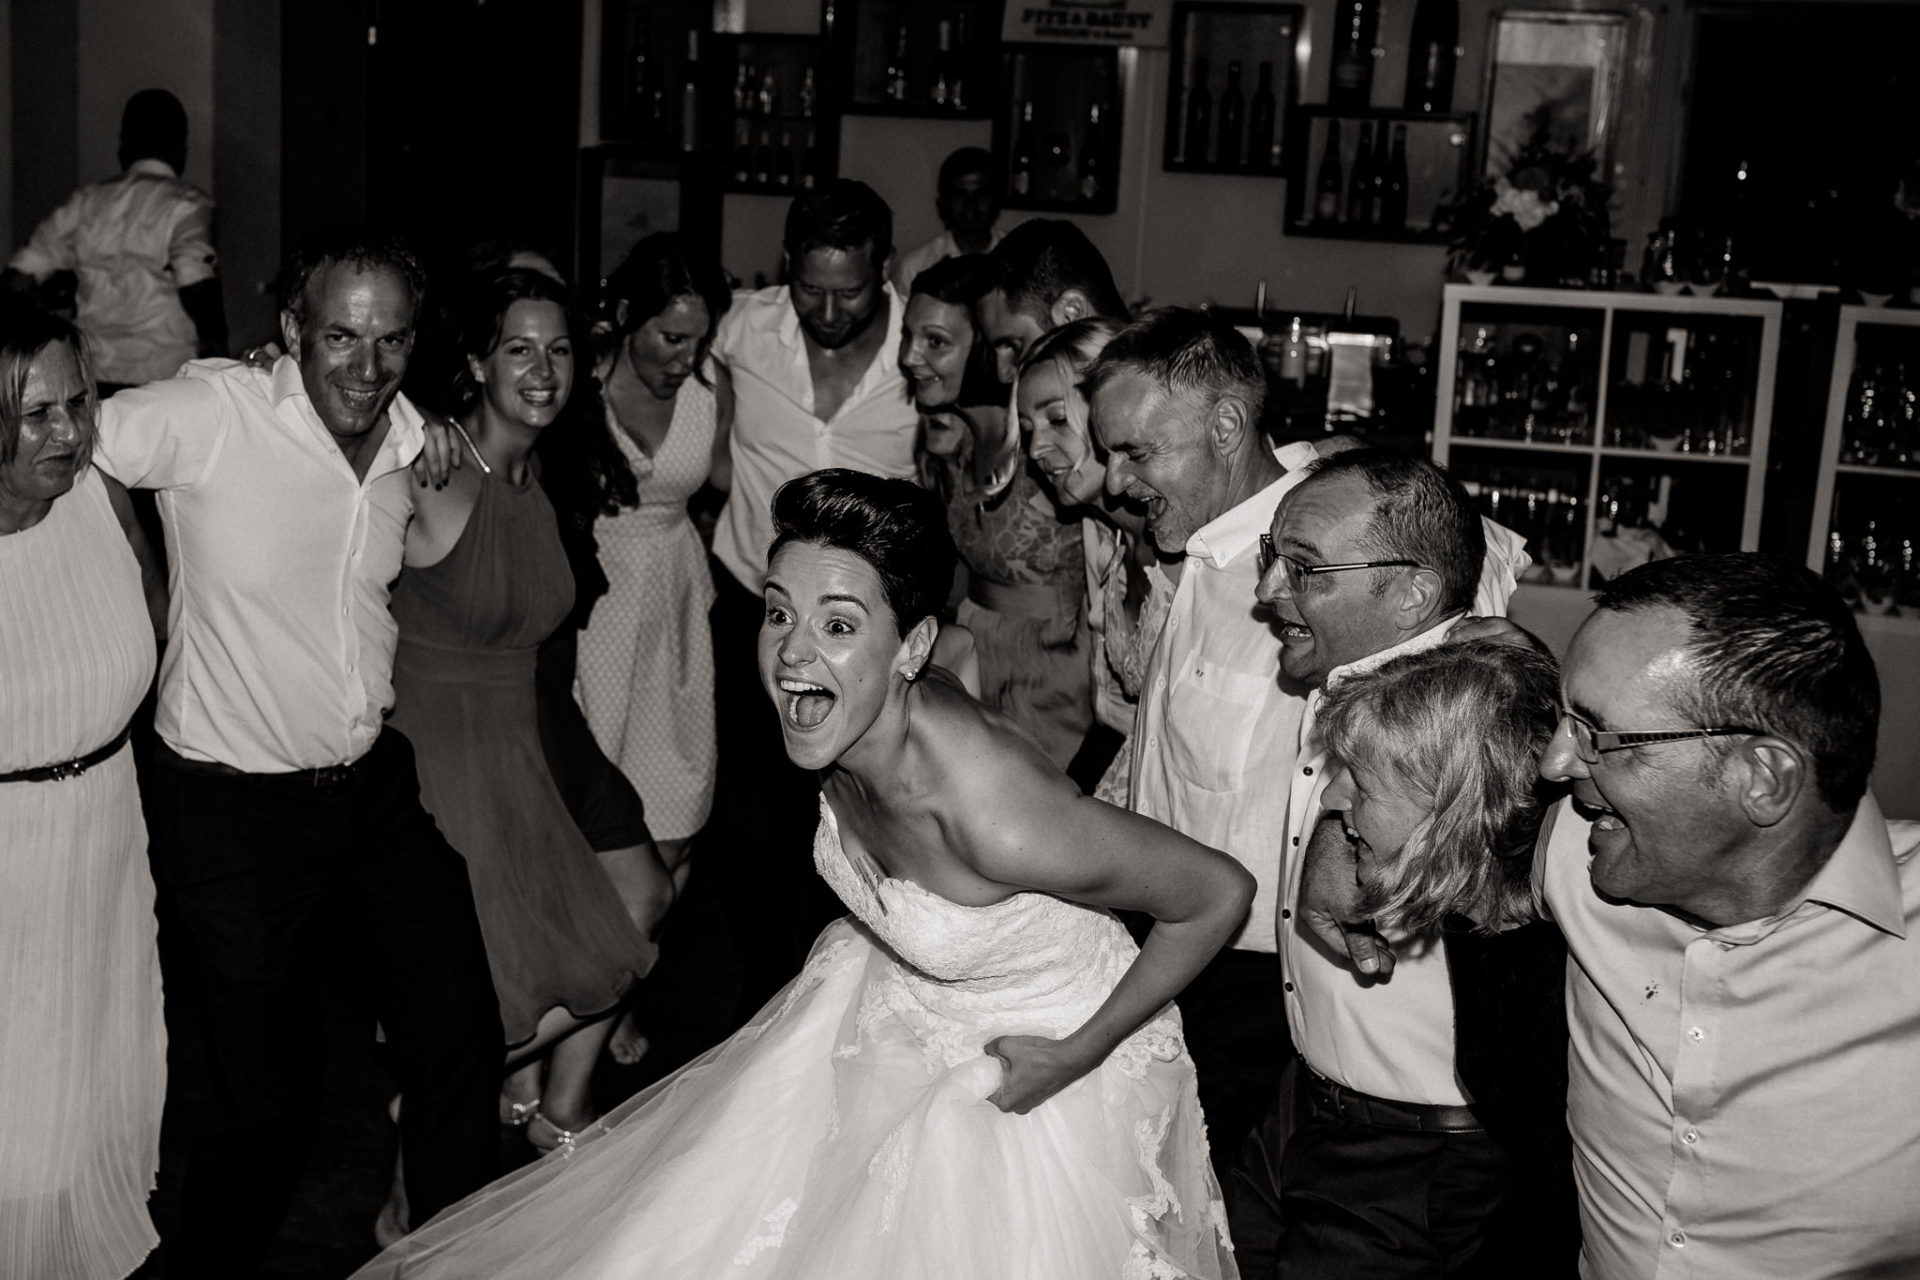 vineyard wedding germany-weingut fitz ritter wedding photographer pfalz party bride dancing